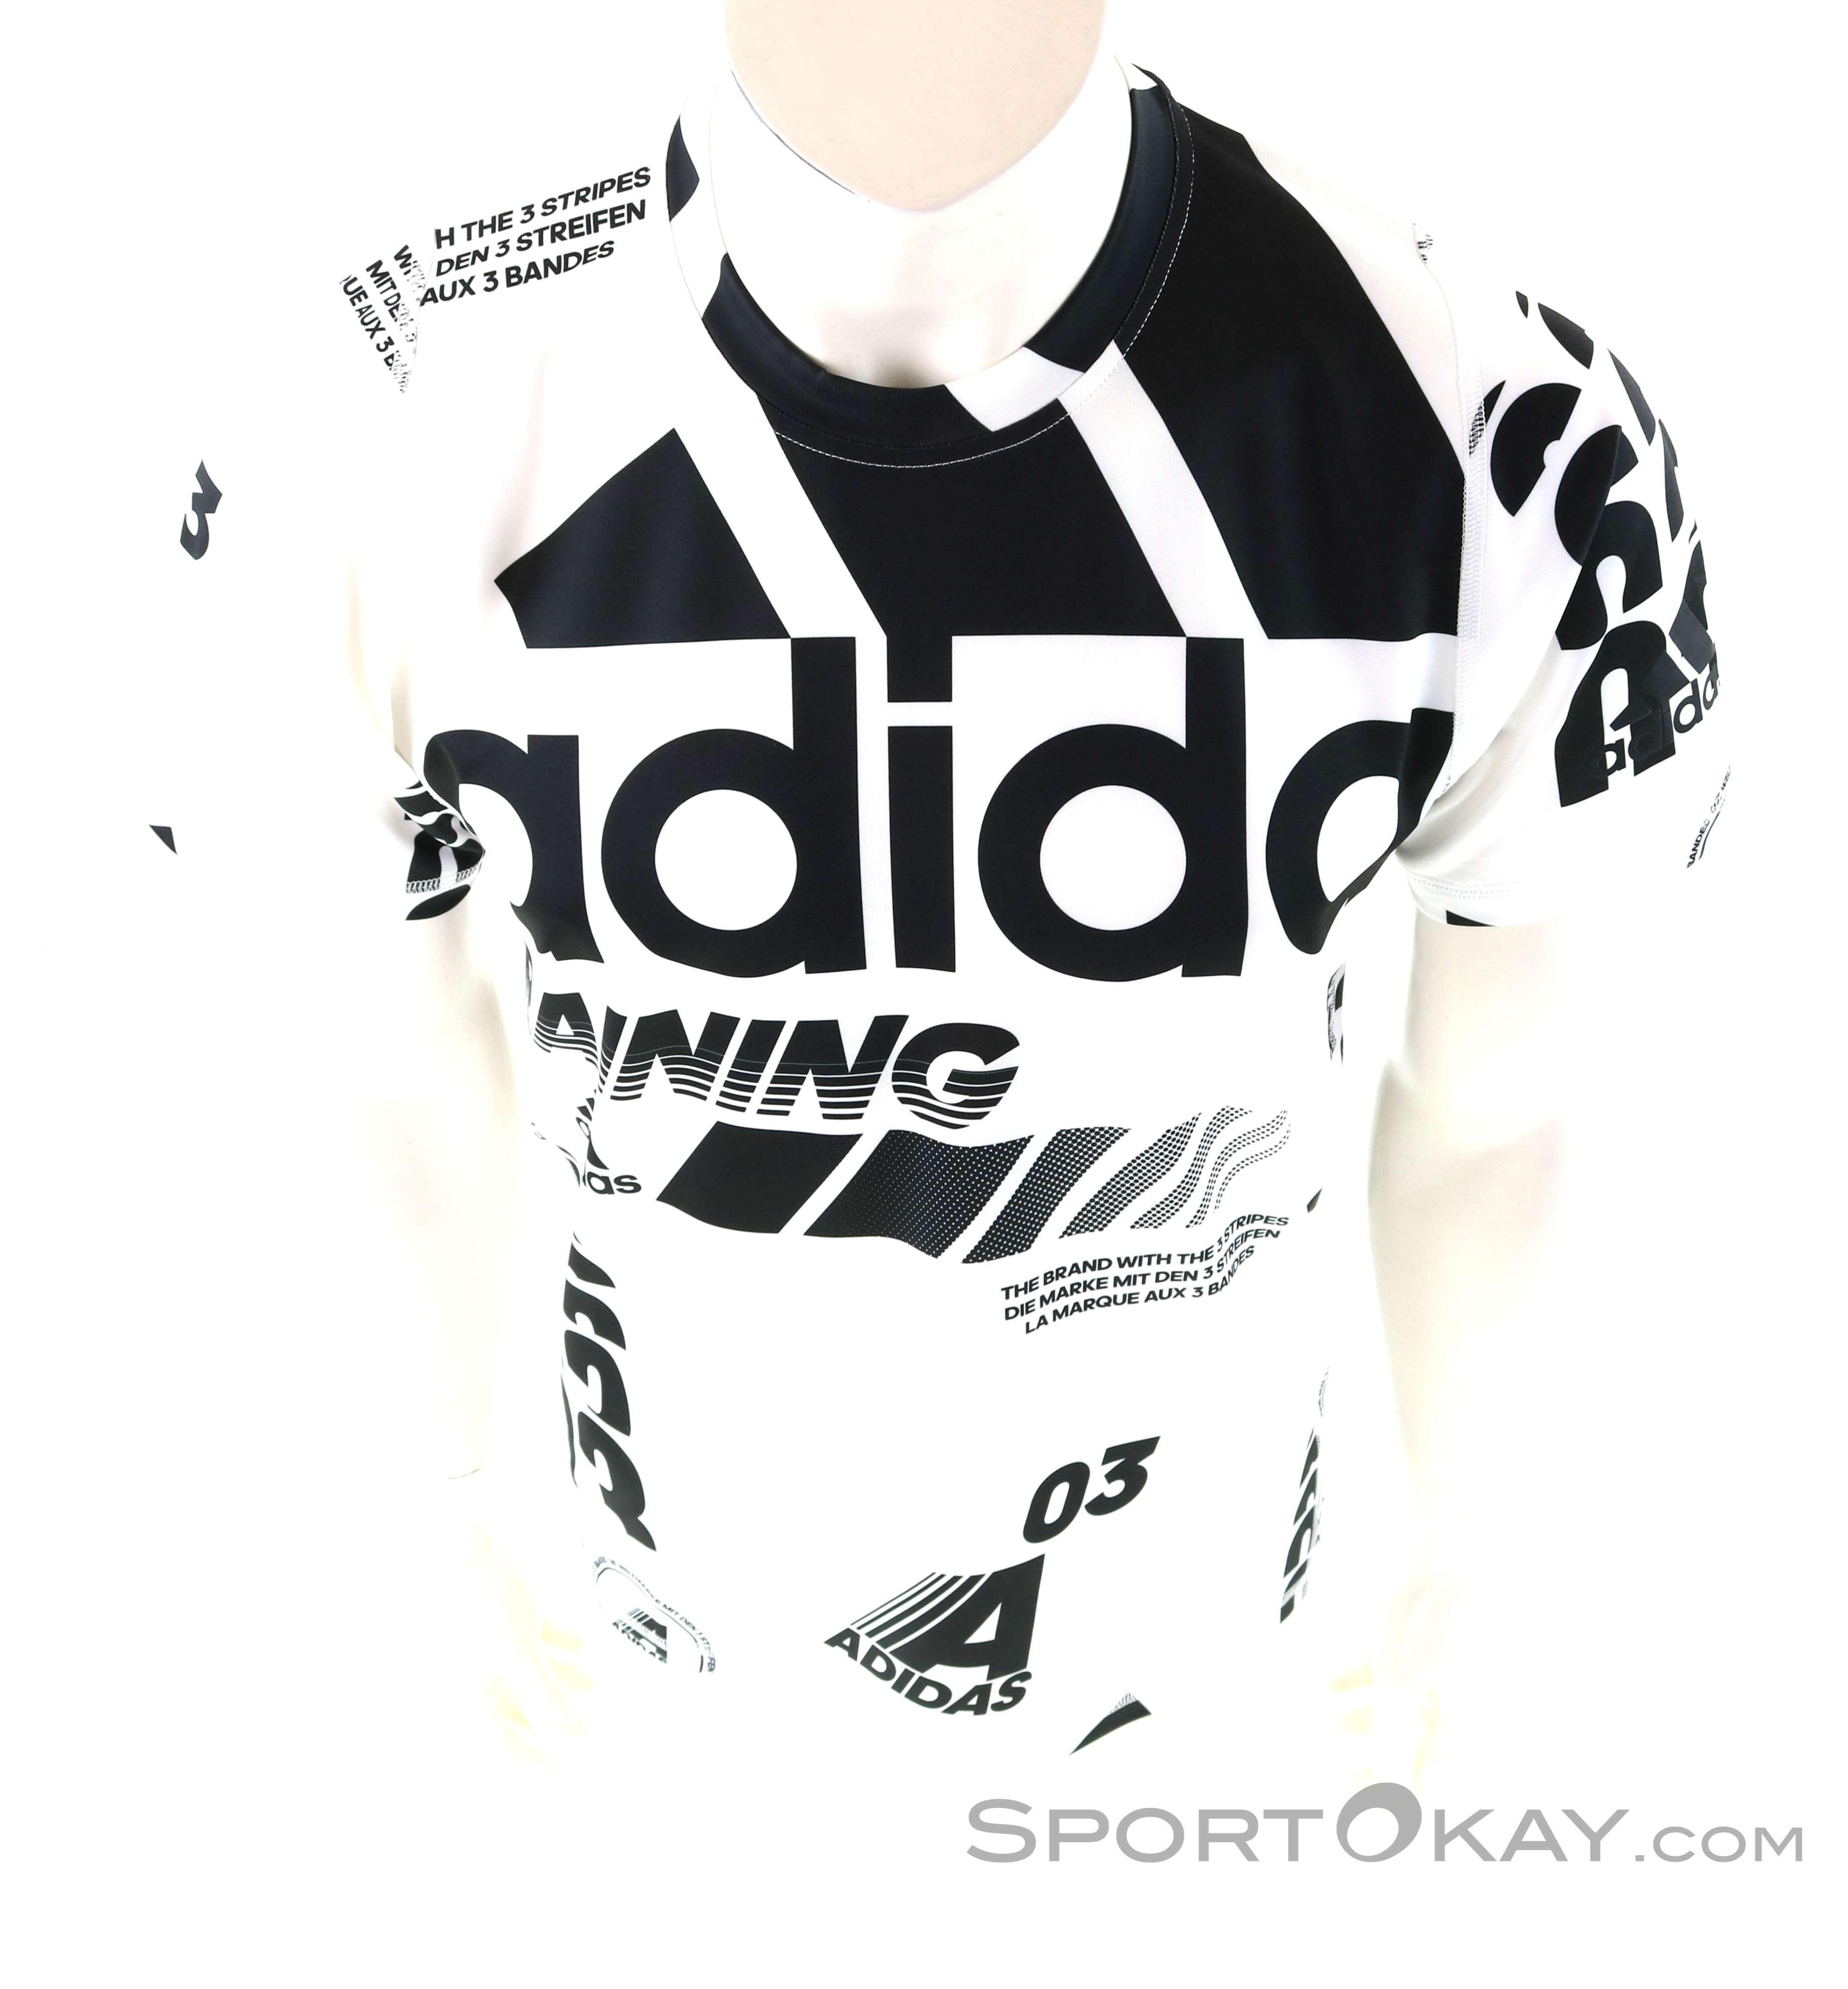 Buy old school adidas sweatshirt 56% OFF! Share discount